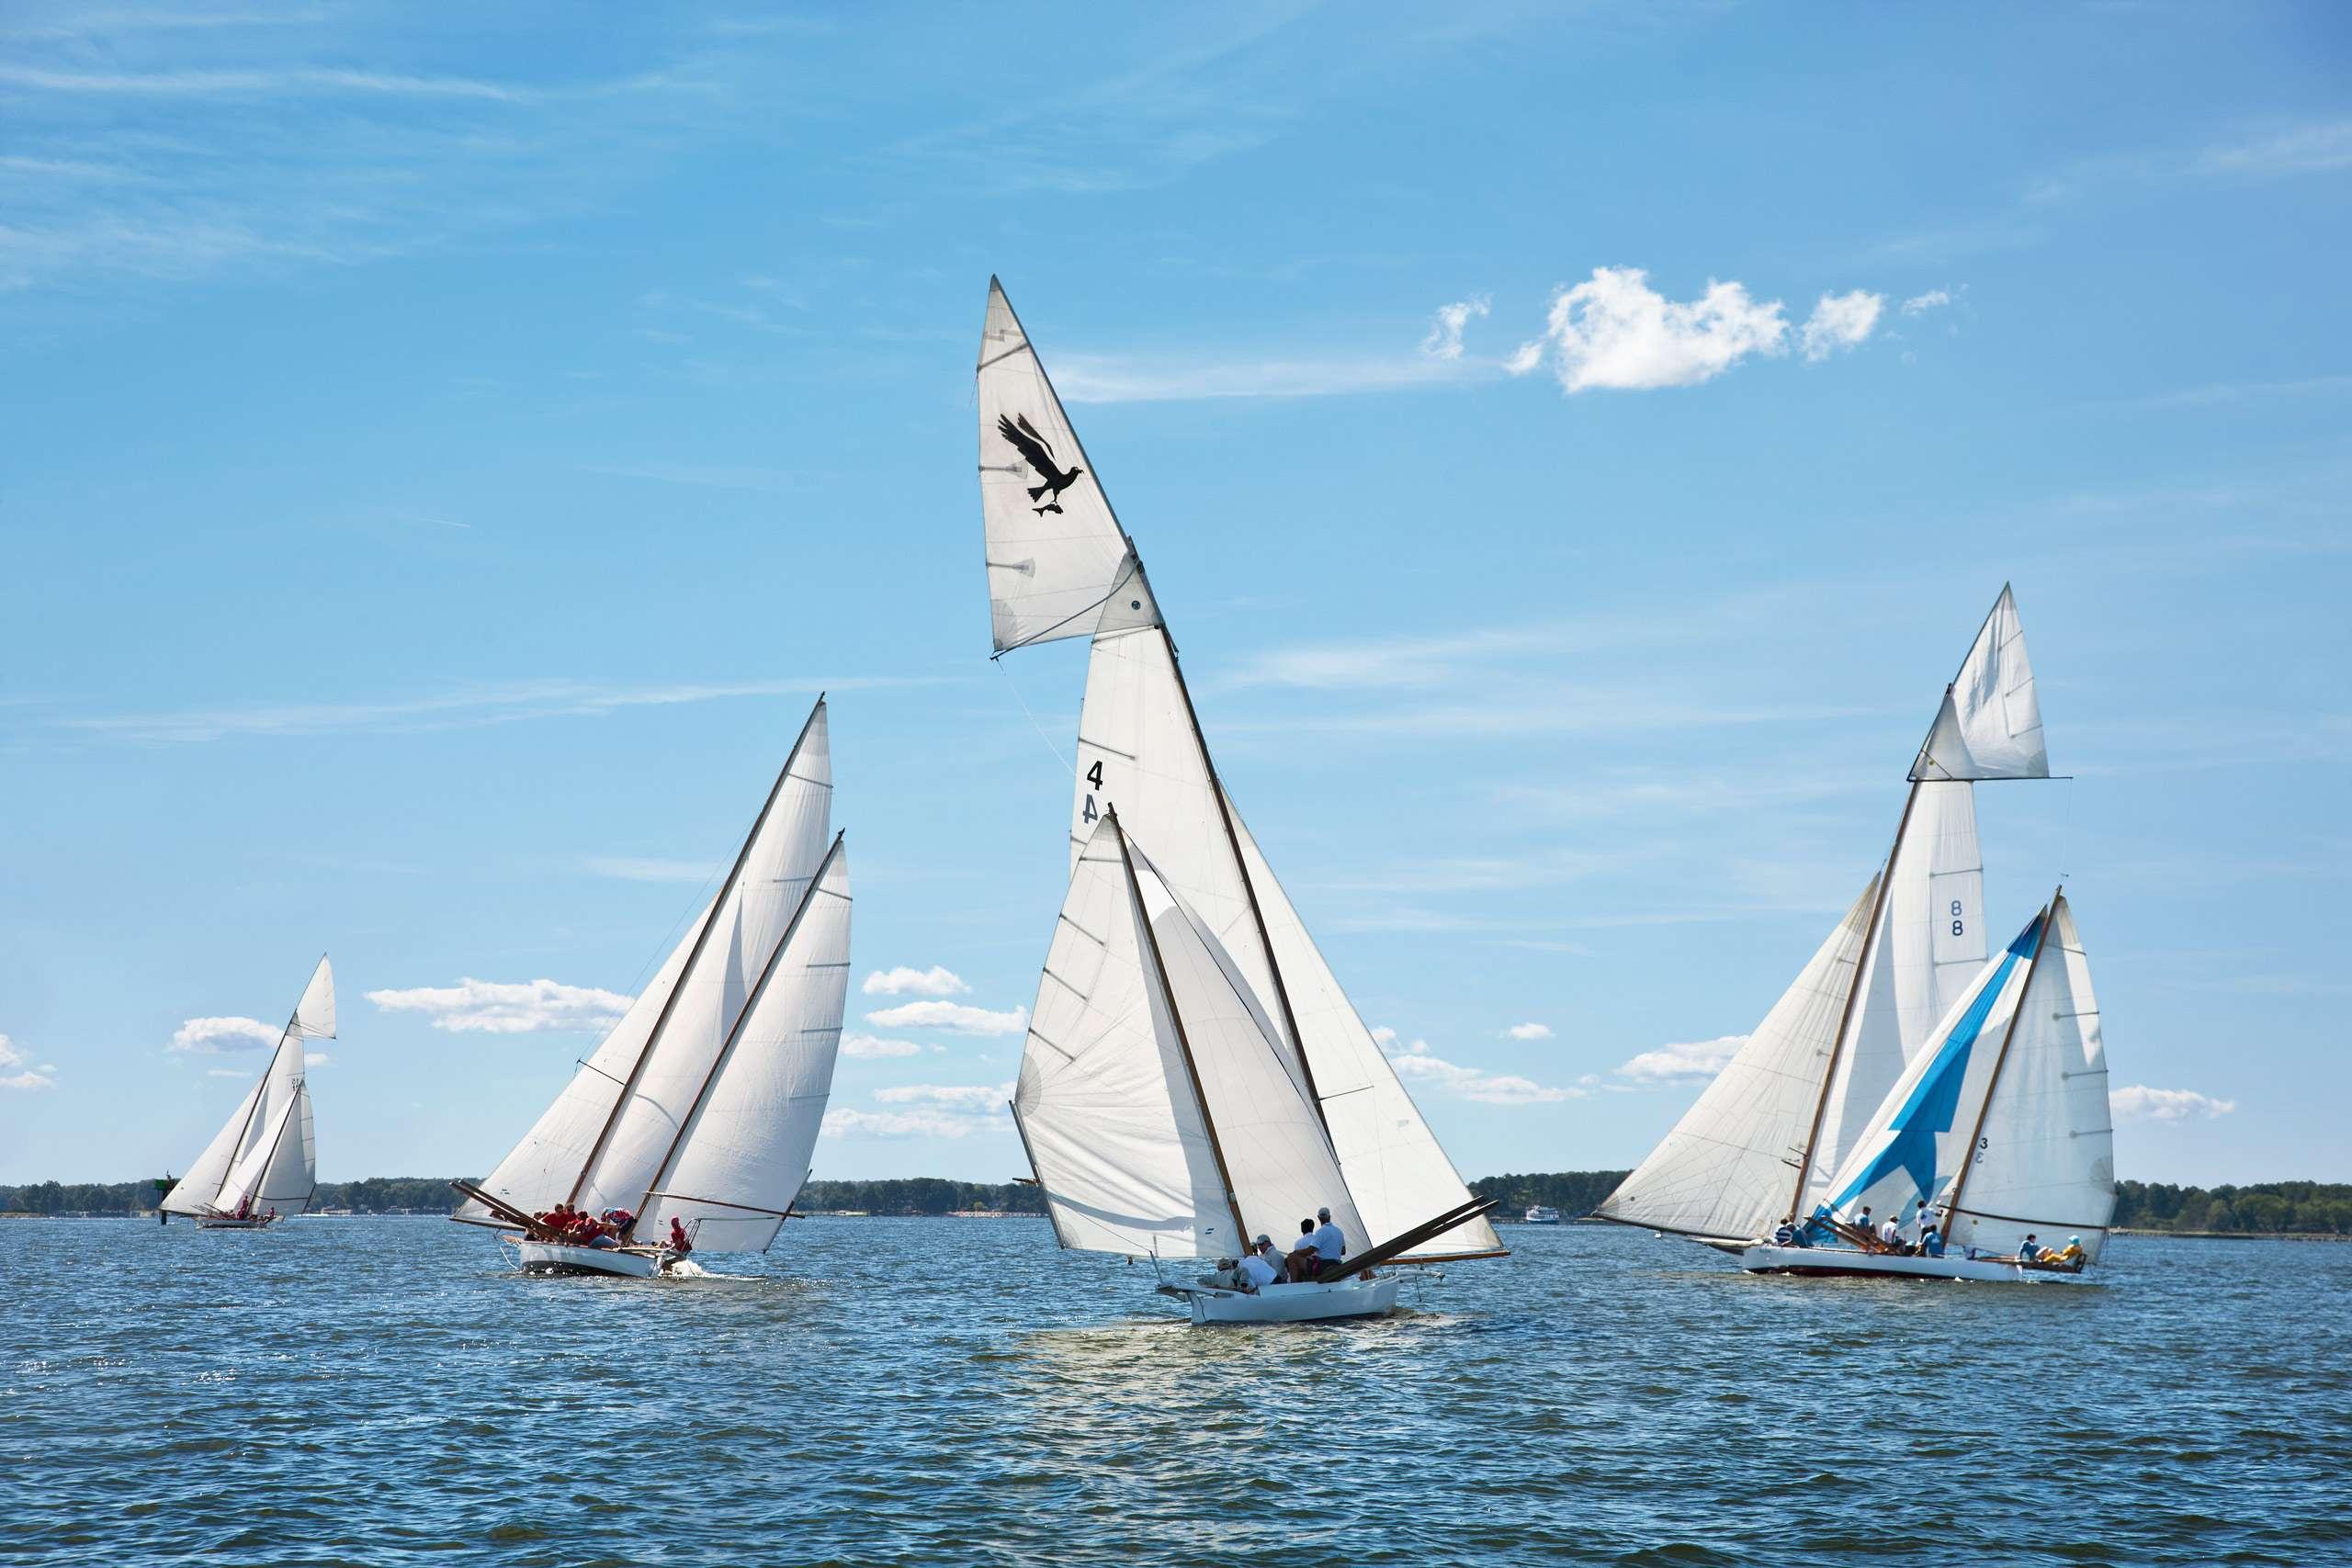 PORTFOLIO - Sailing - Log Canoes #27   PCG575